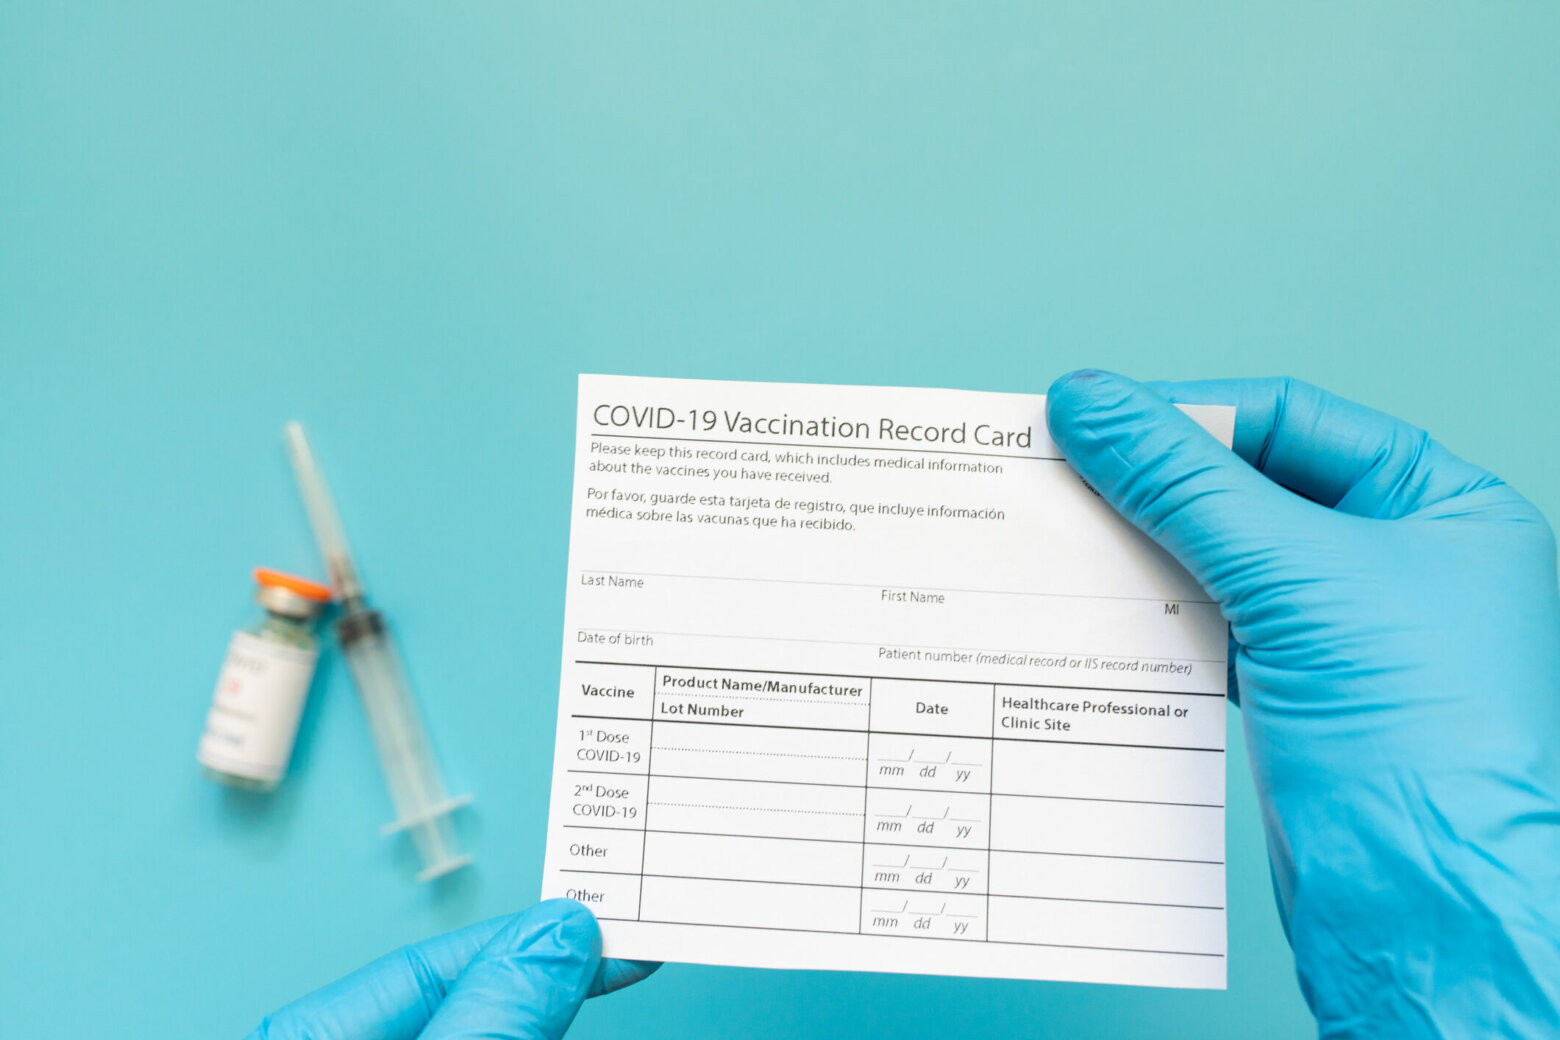 Safeway COVID vaccine records stolen in DC